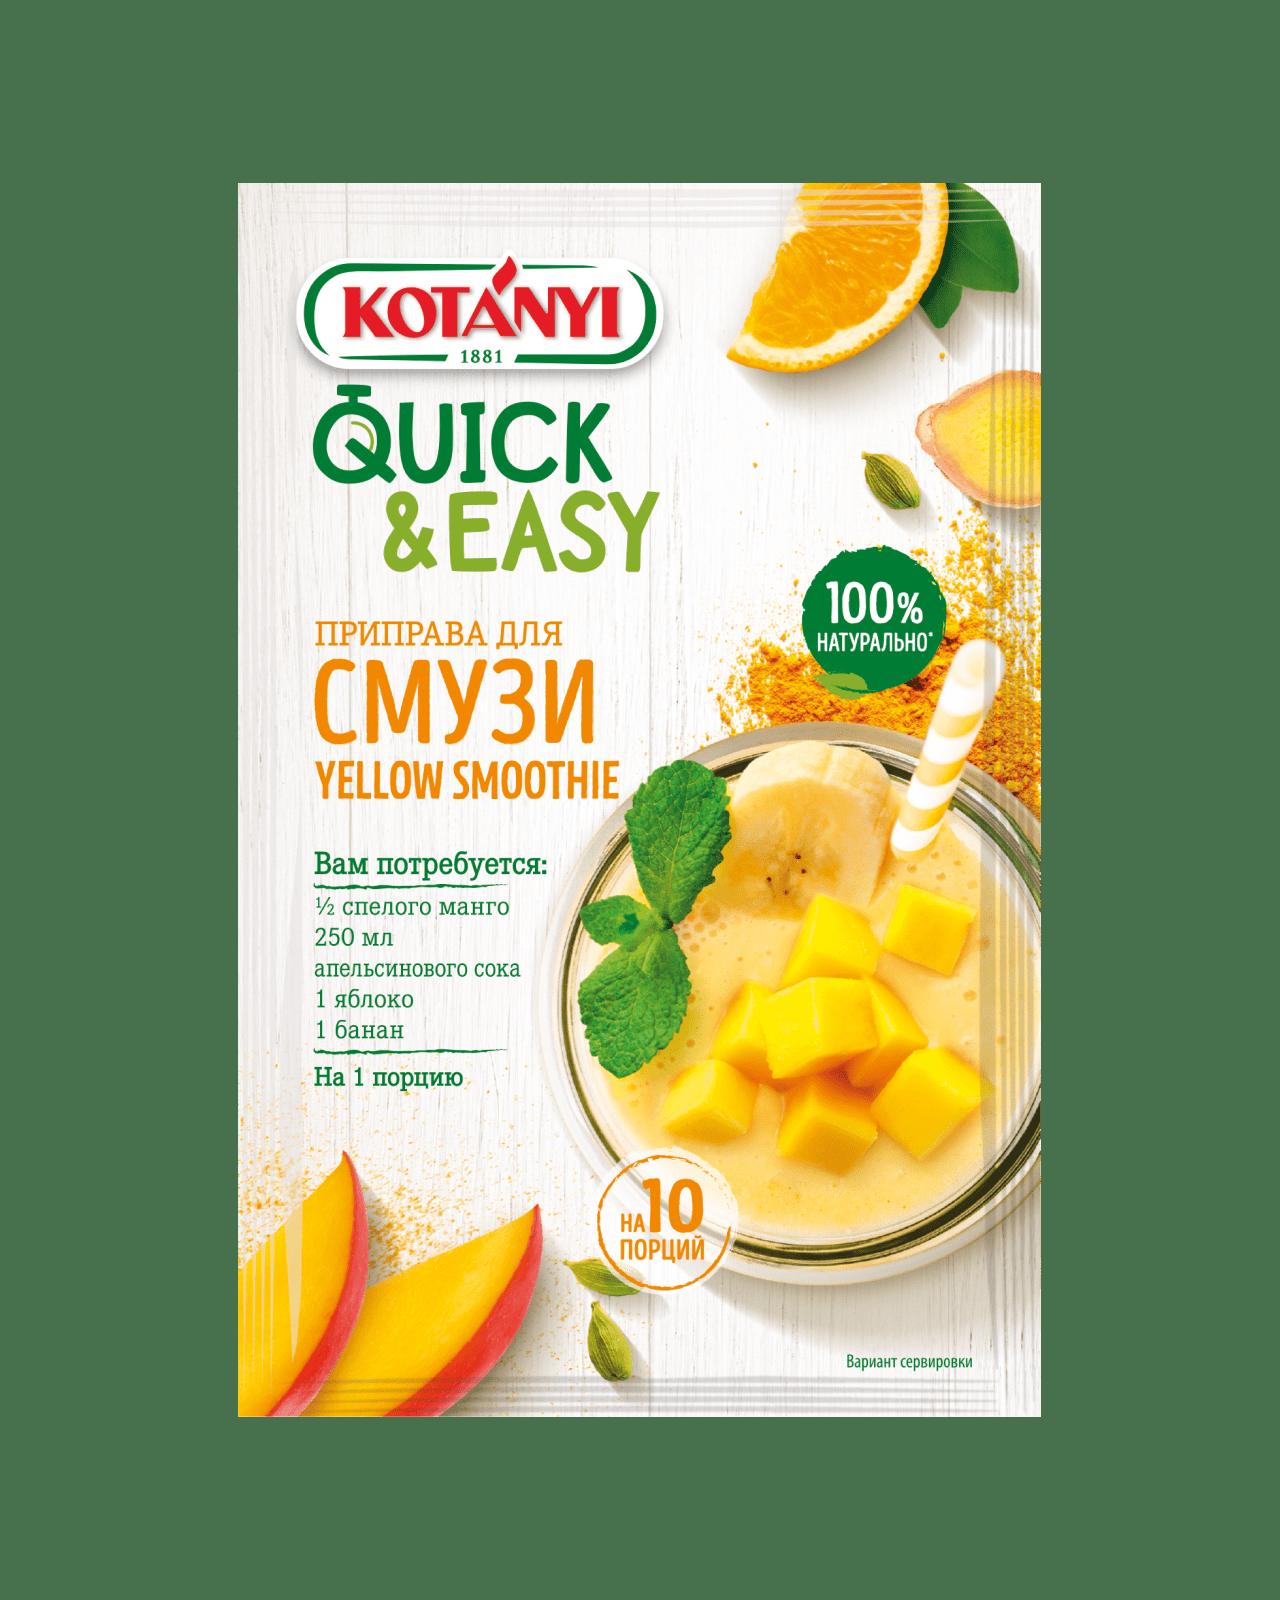 3582117 Quick And Easy Mango Bananen Smoothie Ru 9001414235829 Min